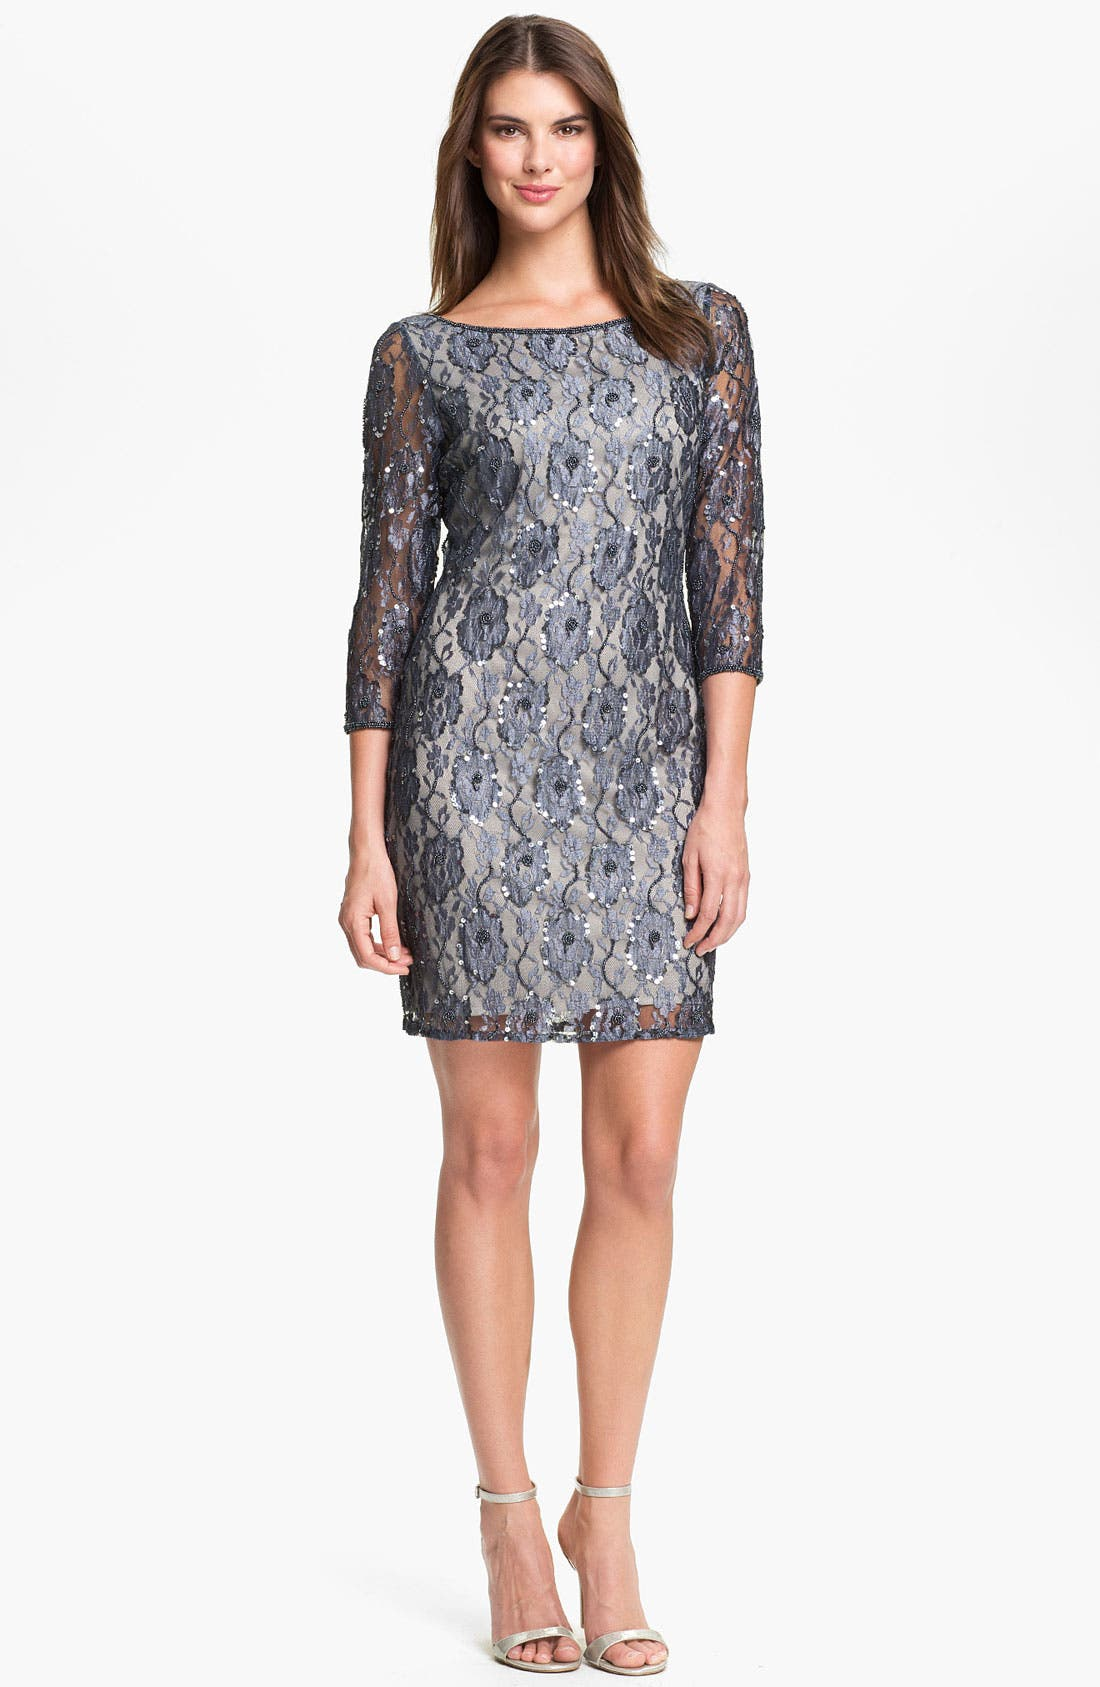 Alternate Image 1 Selected - Pisarro Nights Embellished Lace Sheath Dress